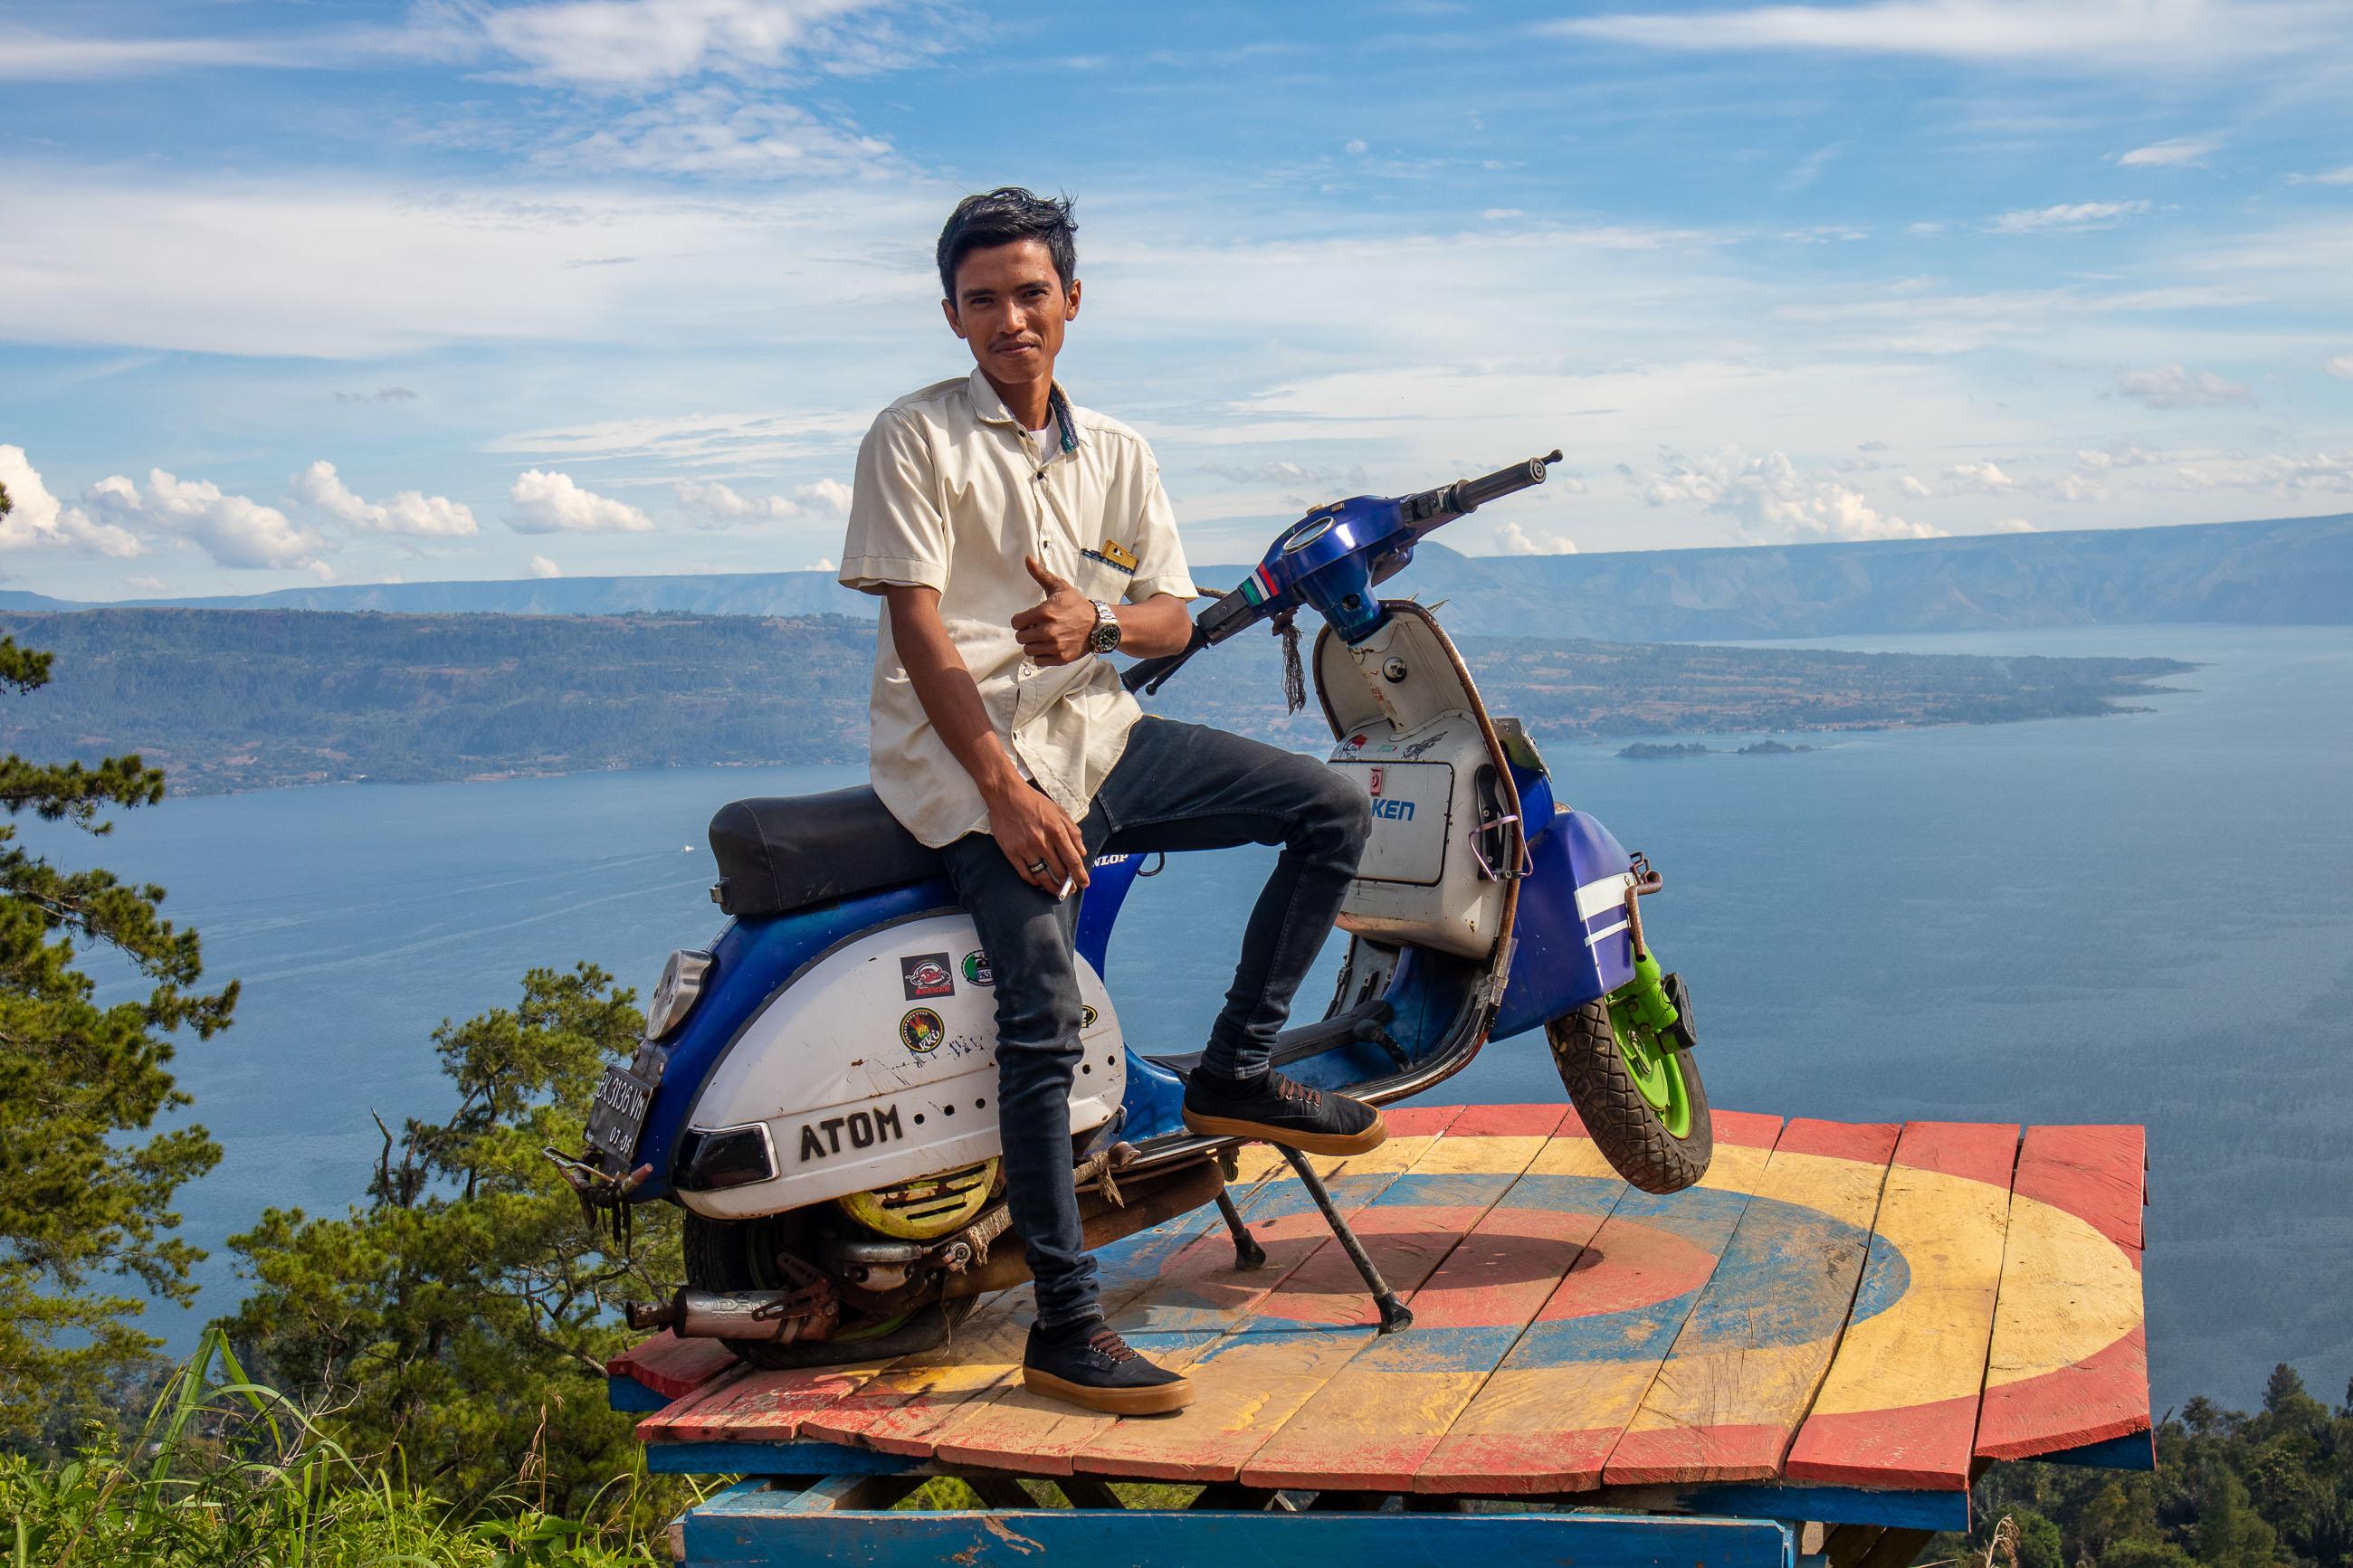 https://bubo.sk/uploads/galleries/7396/tomashornak_indonezia_sumatra_img_0151-1-27.jpg